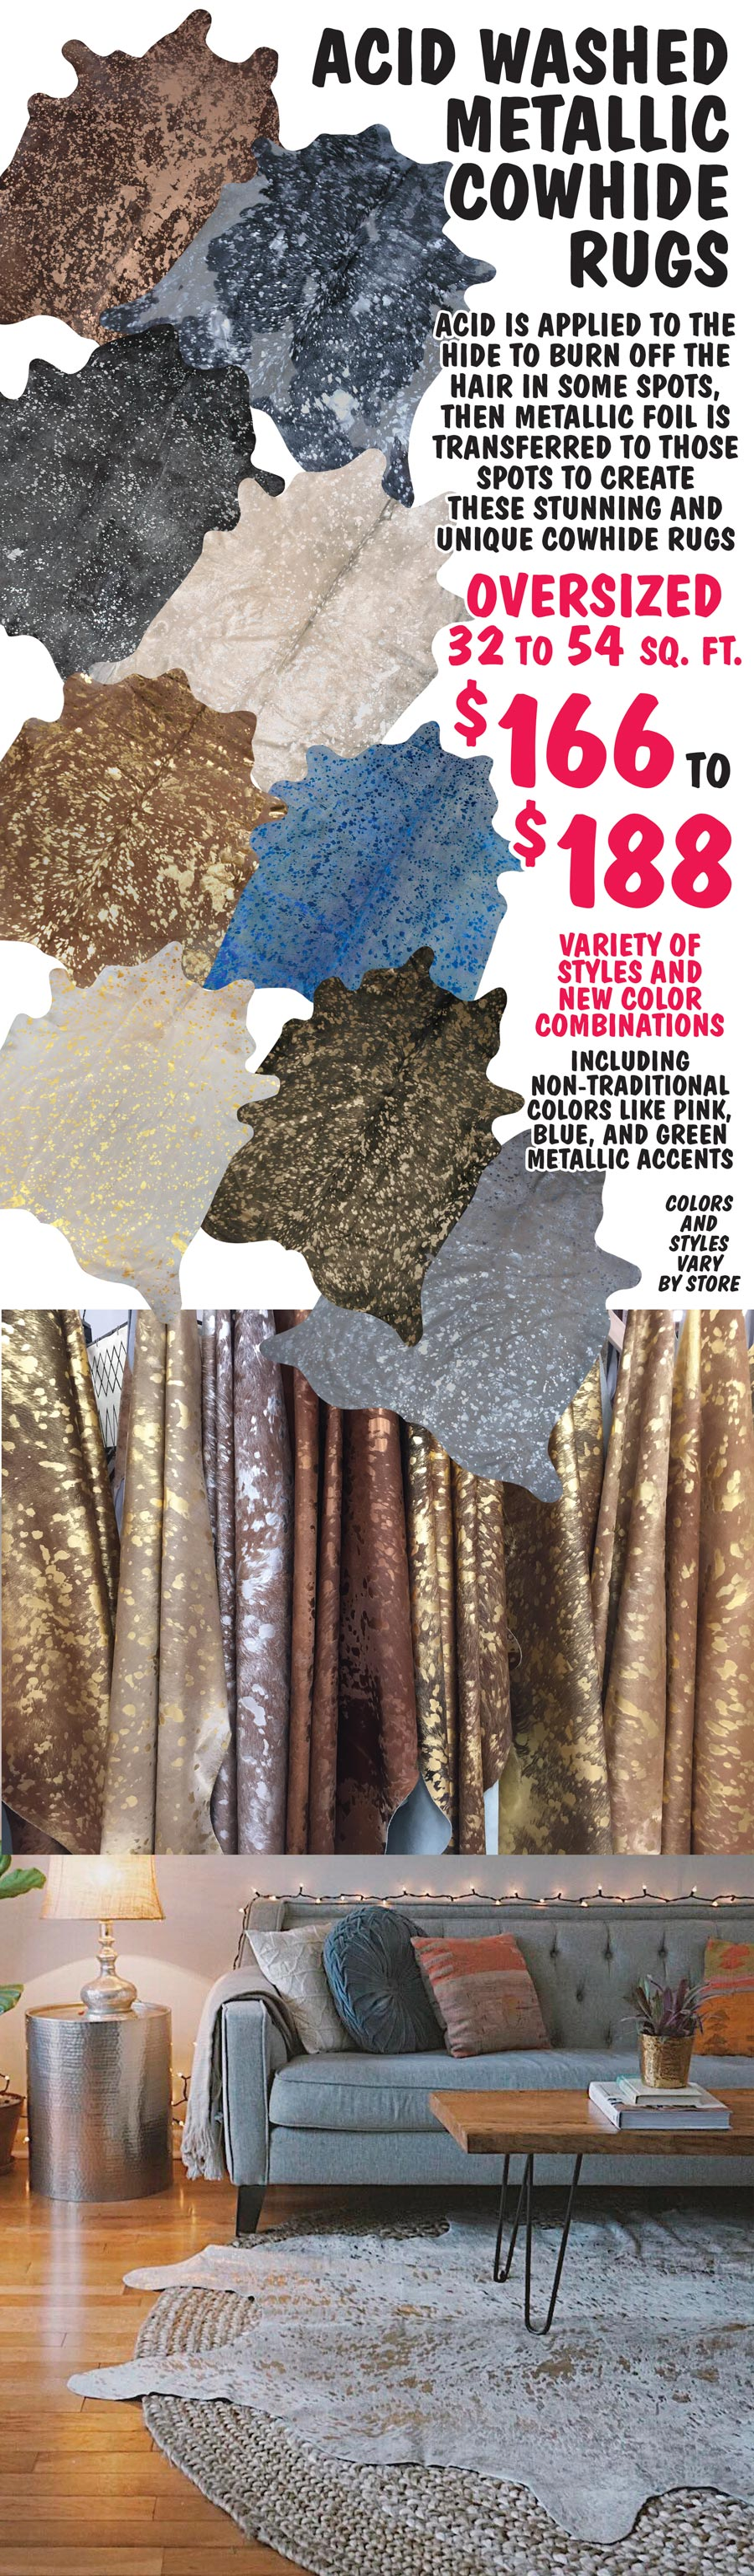 Acid Washed Metallic Cowhide Rugs $166 to $188